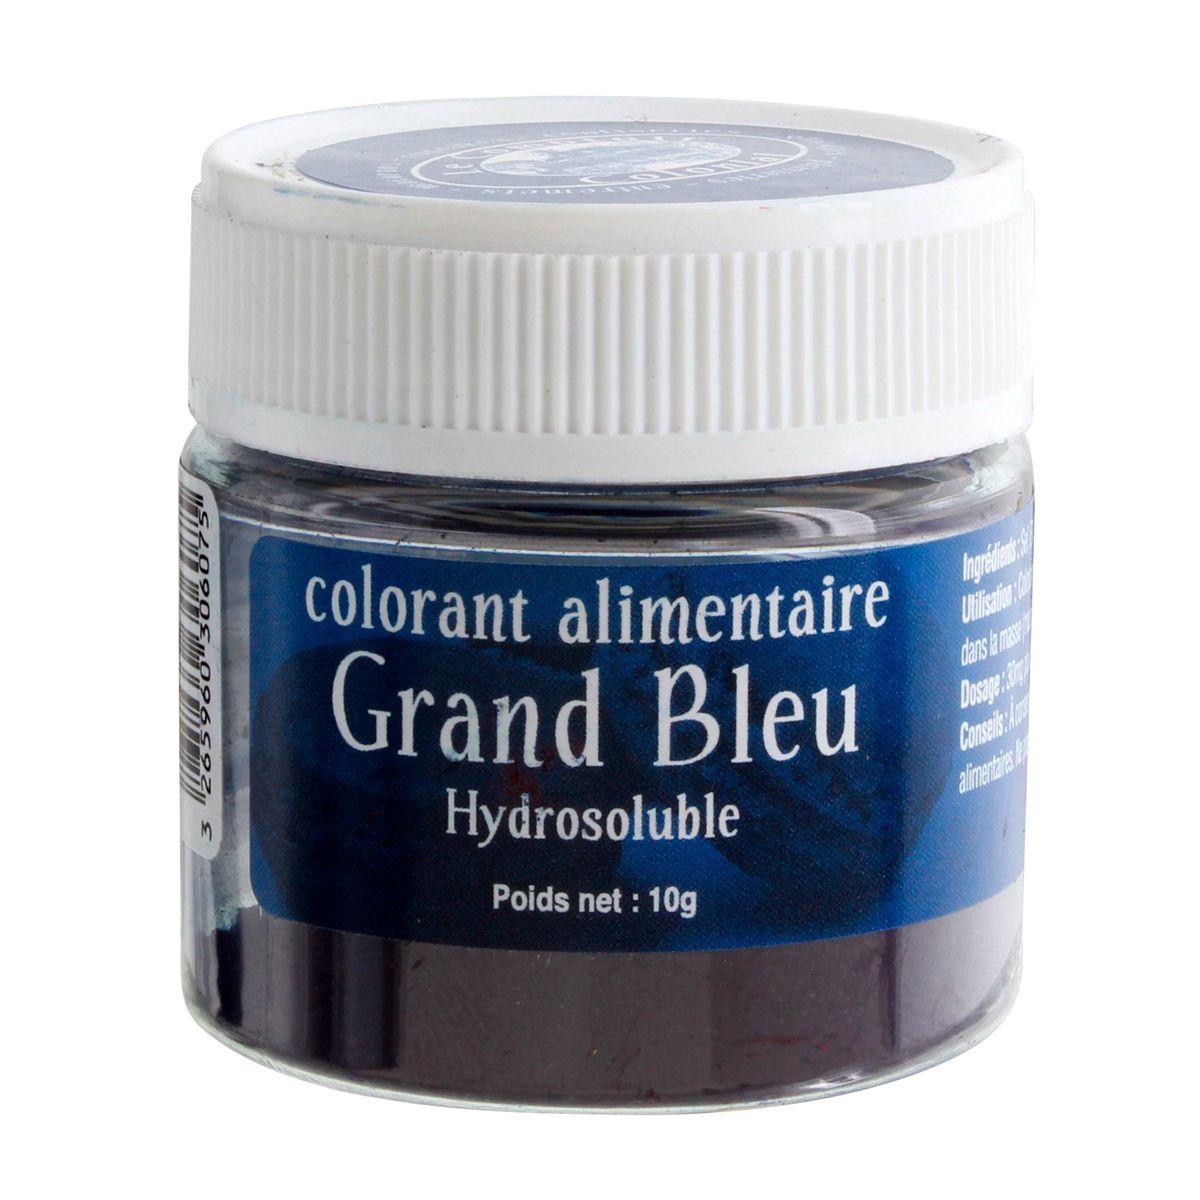 Colorant alimentaire hydrosoluble grand bleu 10 gr - Le Comptoir Colonial